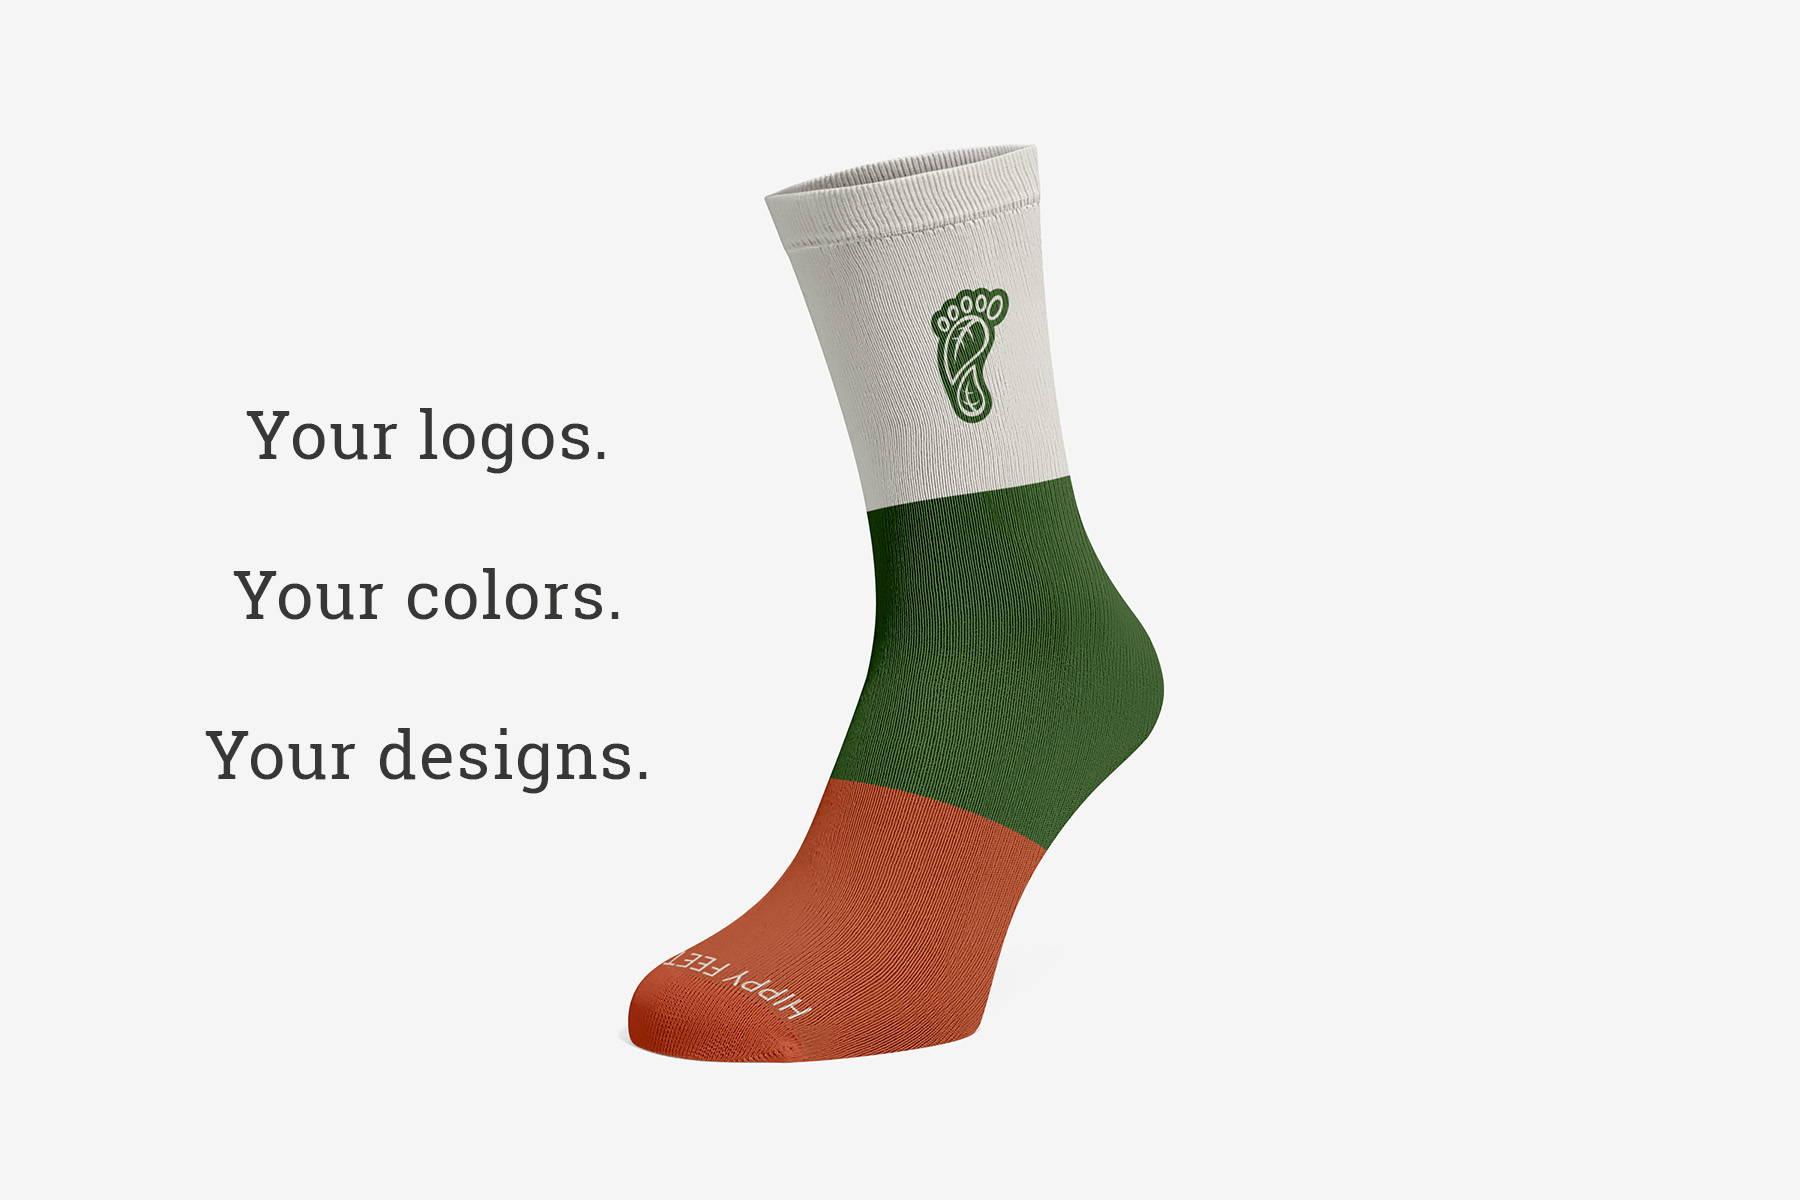 Creating custom socks with Hippy Feet